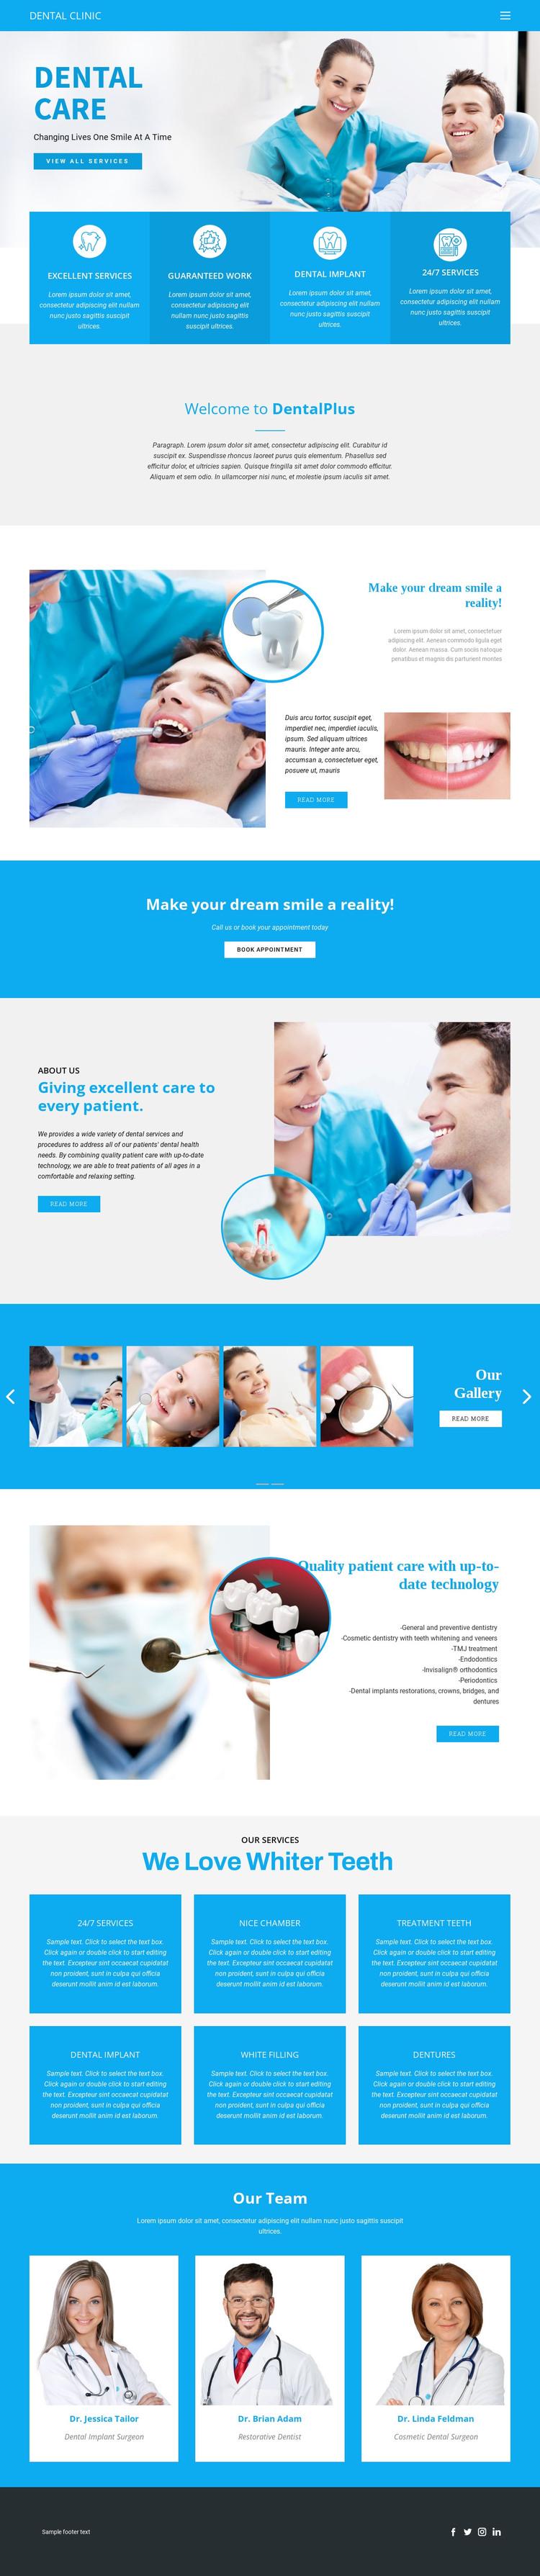 Dental care and medicine Web Design